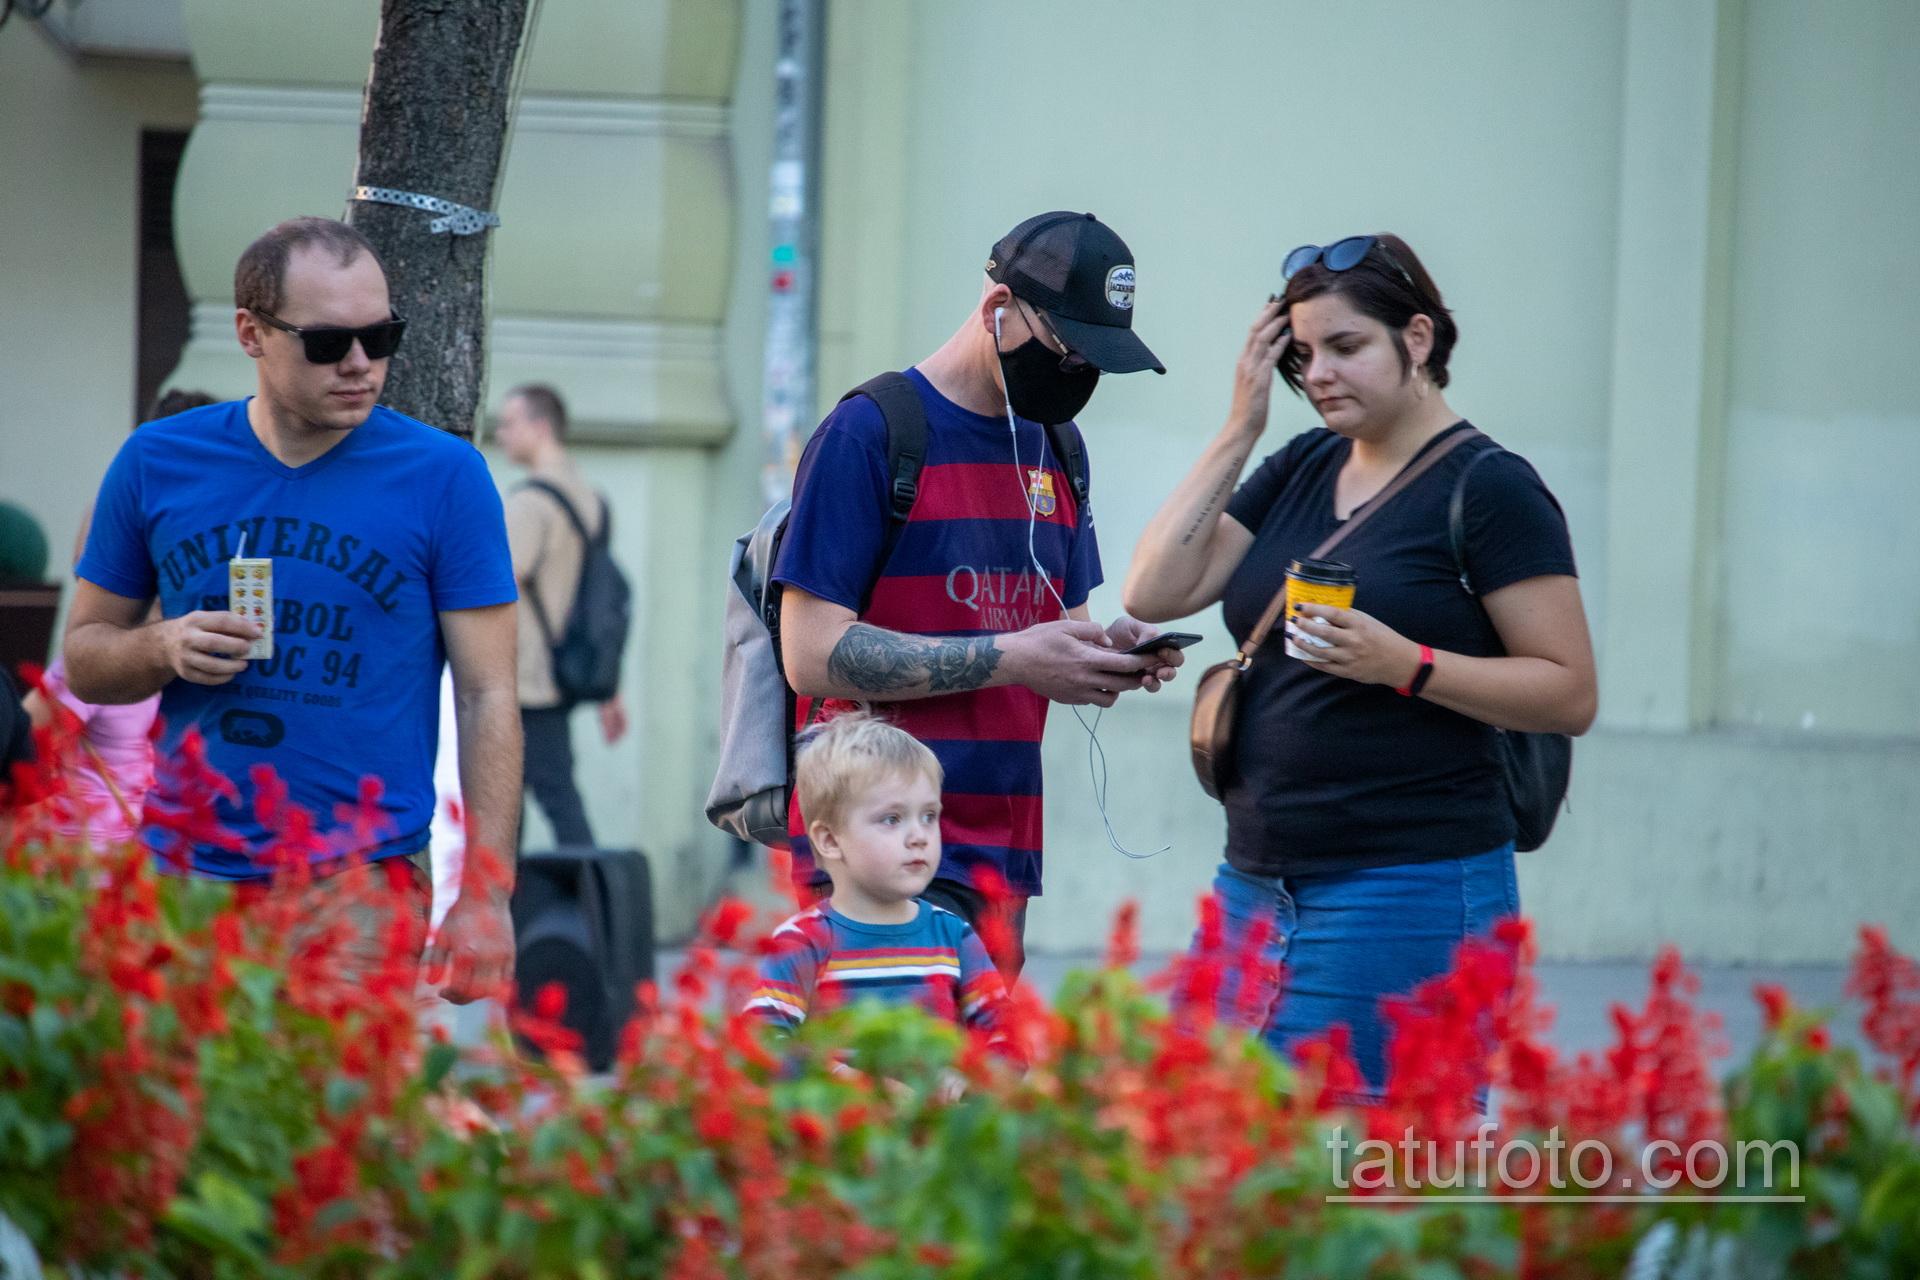 Тату девушка Санта Муэрто и роза на руке парня – Уличная татуировка 14.09.2020 – tatufoto.com 1